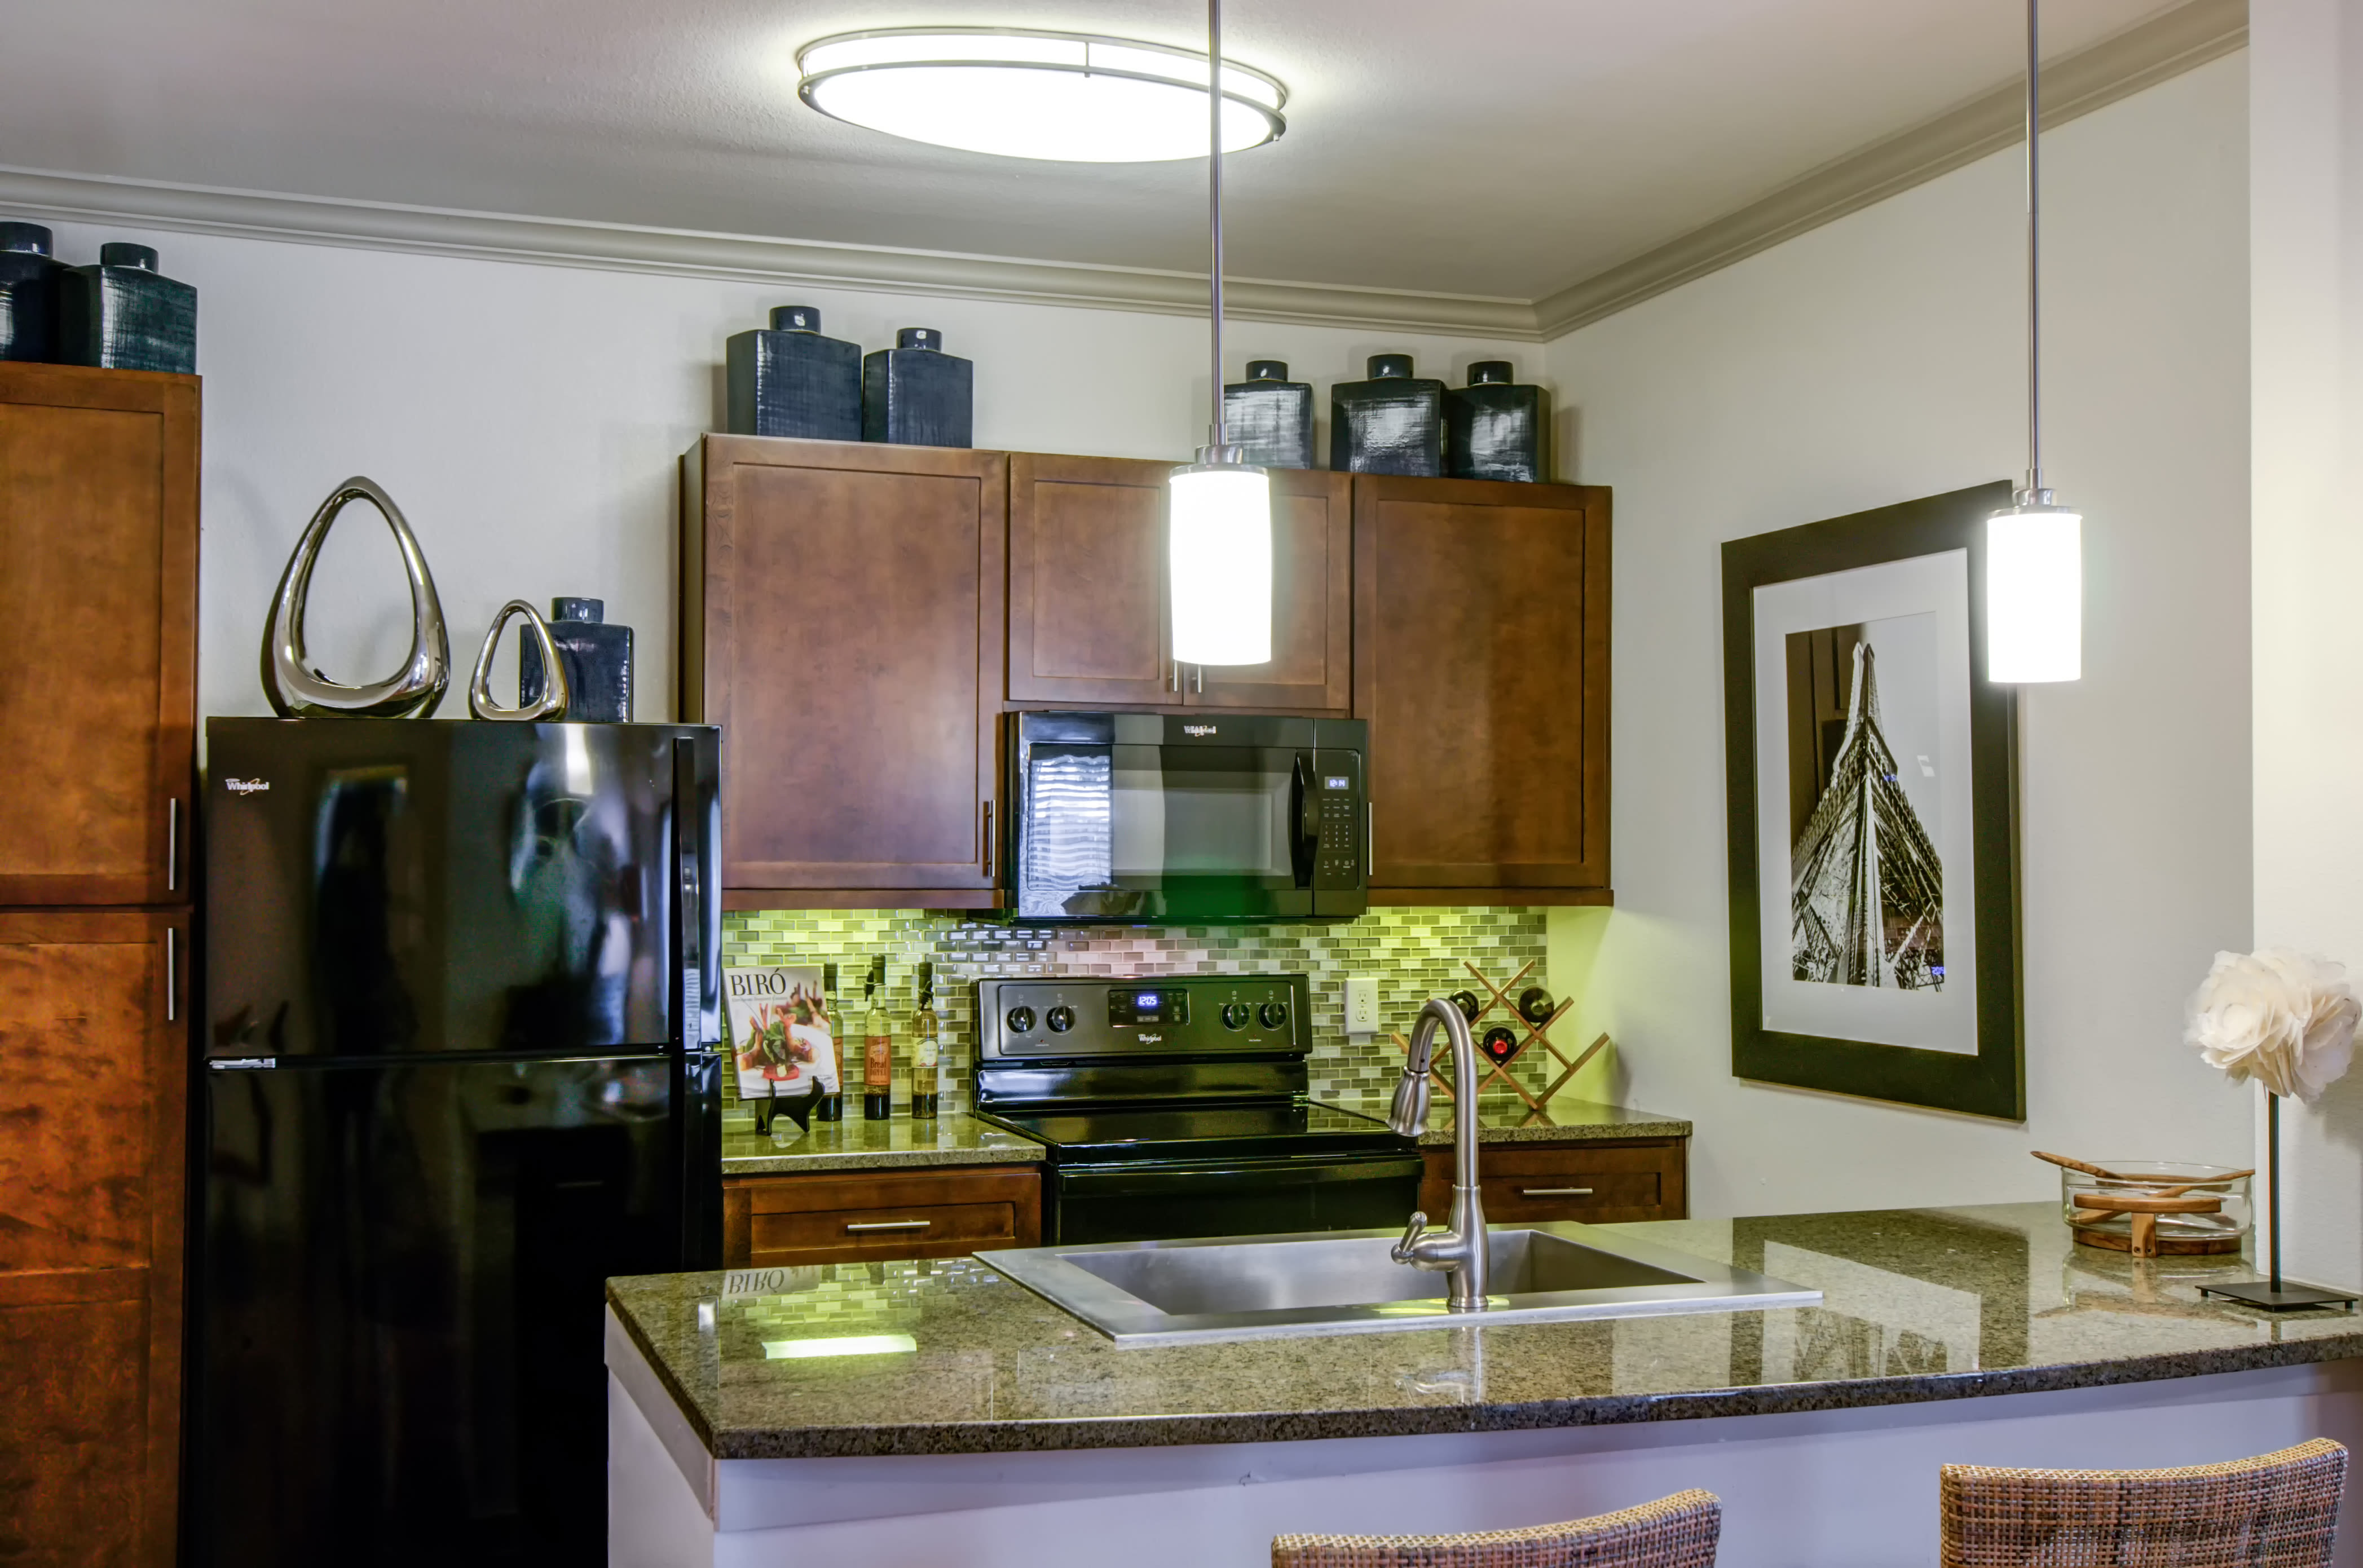 Granite countertop kitchen with bar seating at Firewheel Apartments in San Antonio